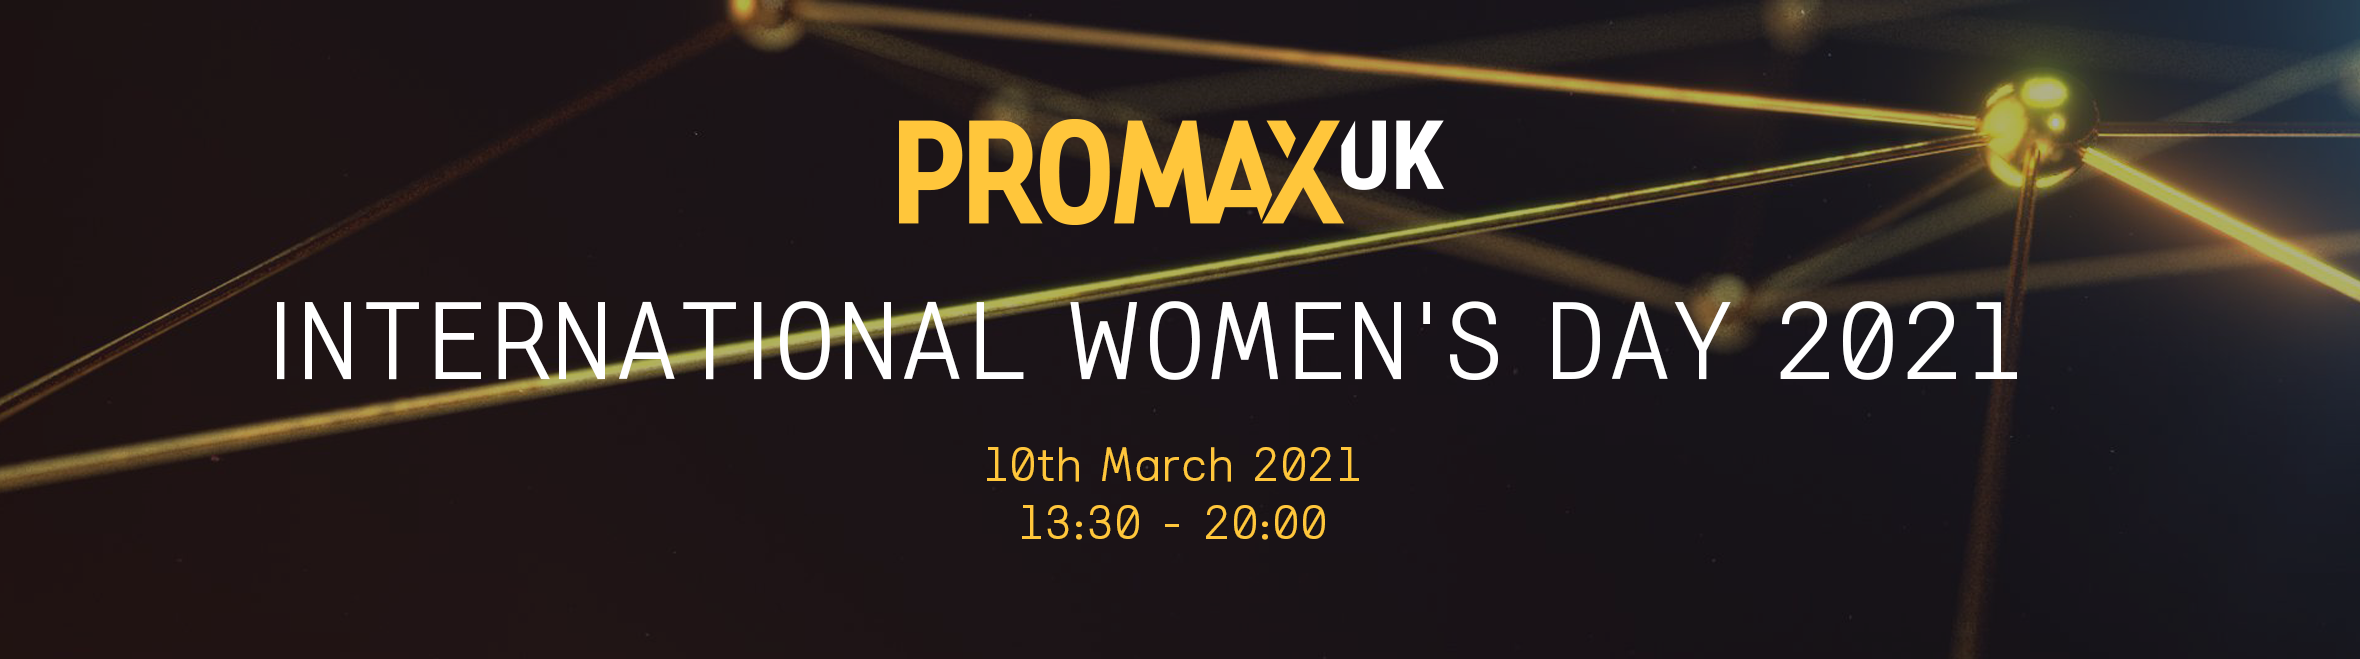 Promax International womens day